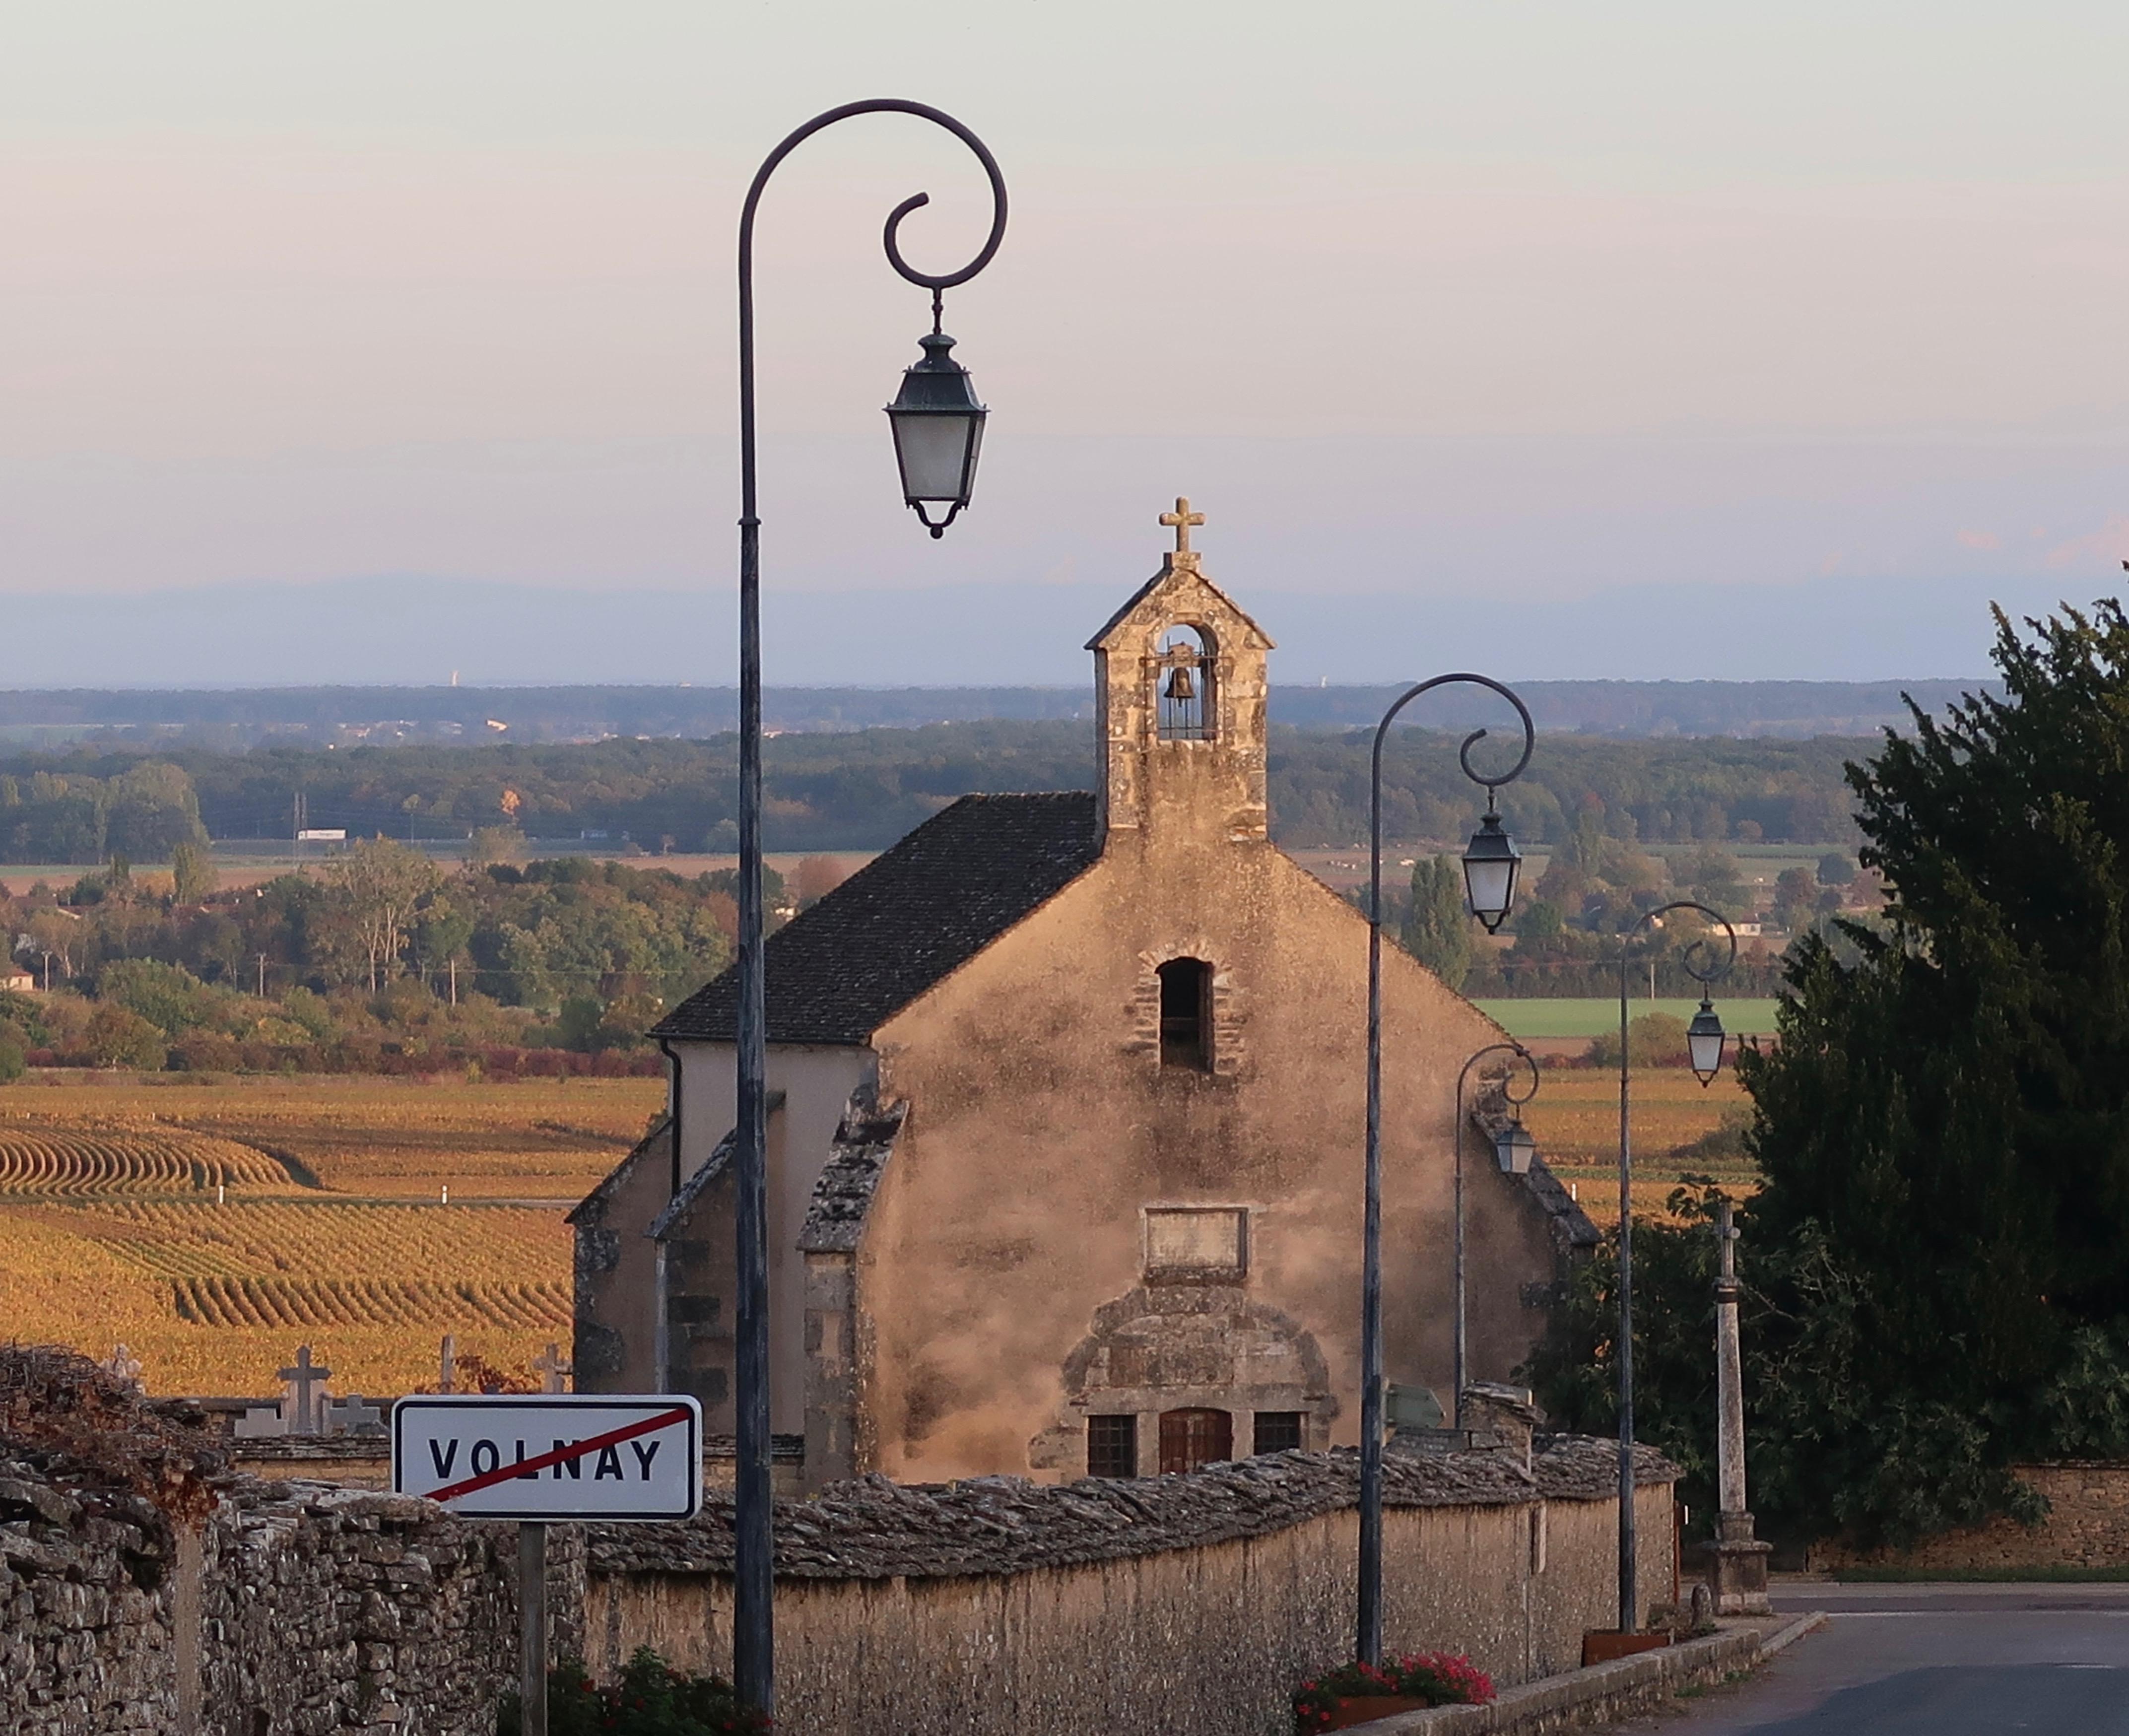 Domaine Joseph Voillot's Volnay